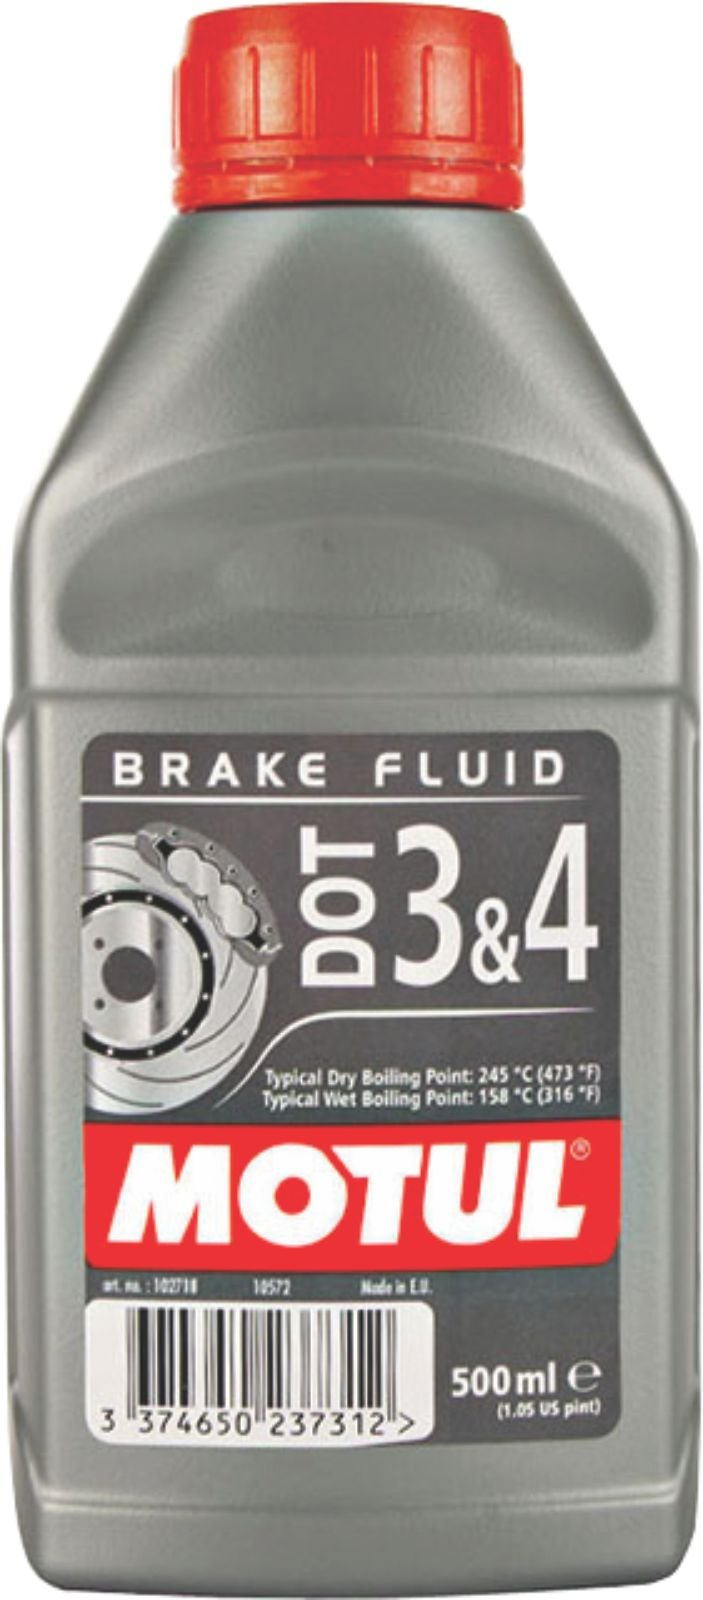 Motul Dot 3 and 4 Brake Fluid (0.5 L) product image